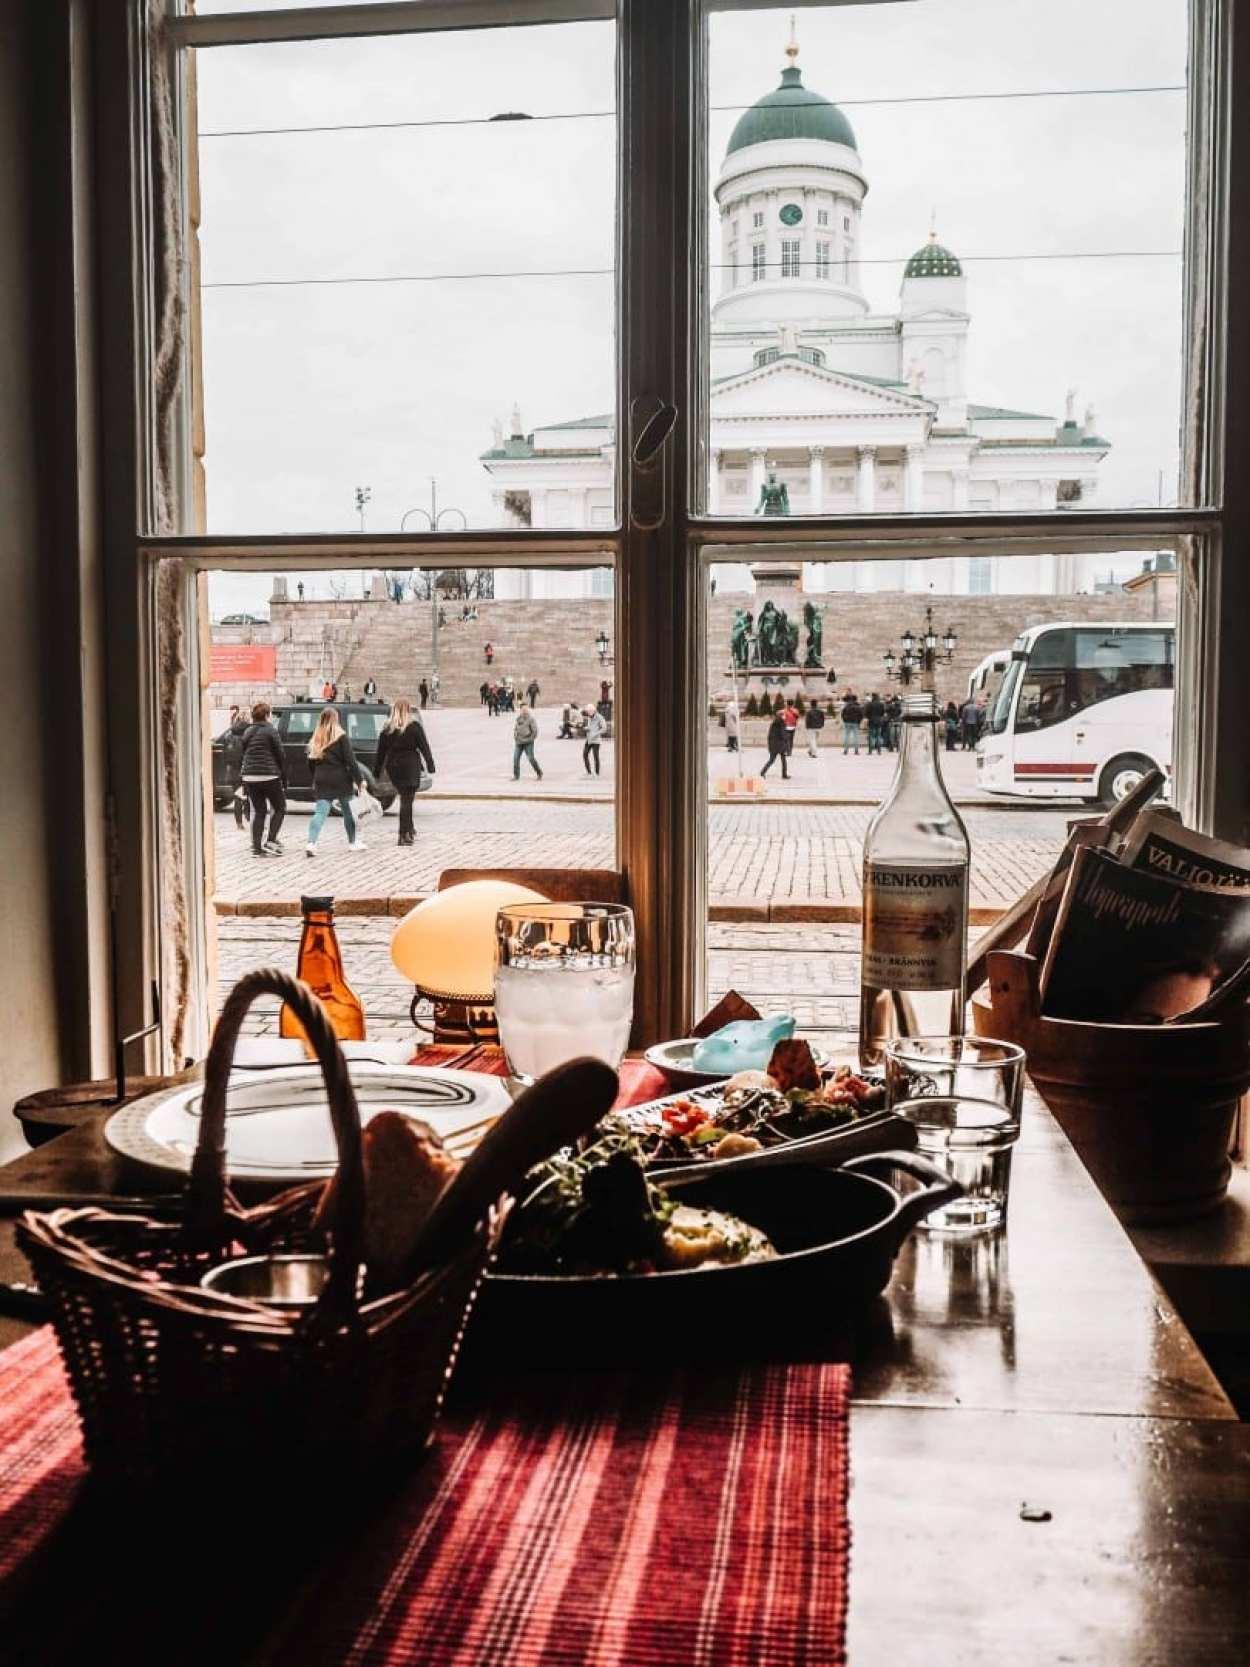 where to eat in helsinki